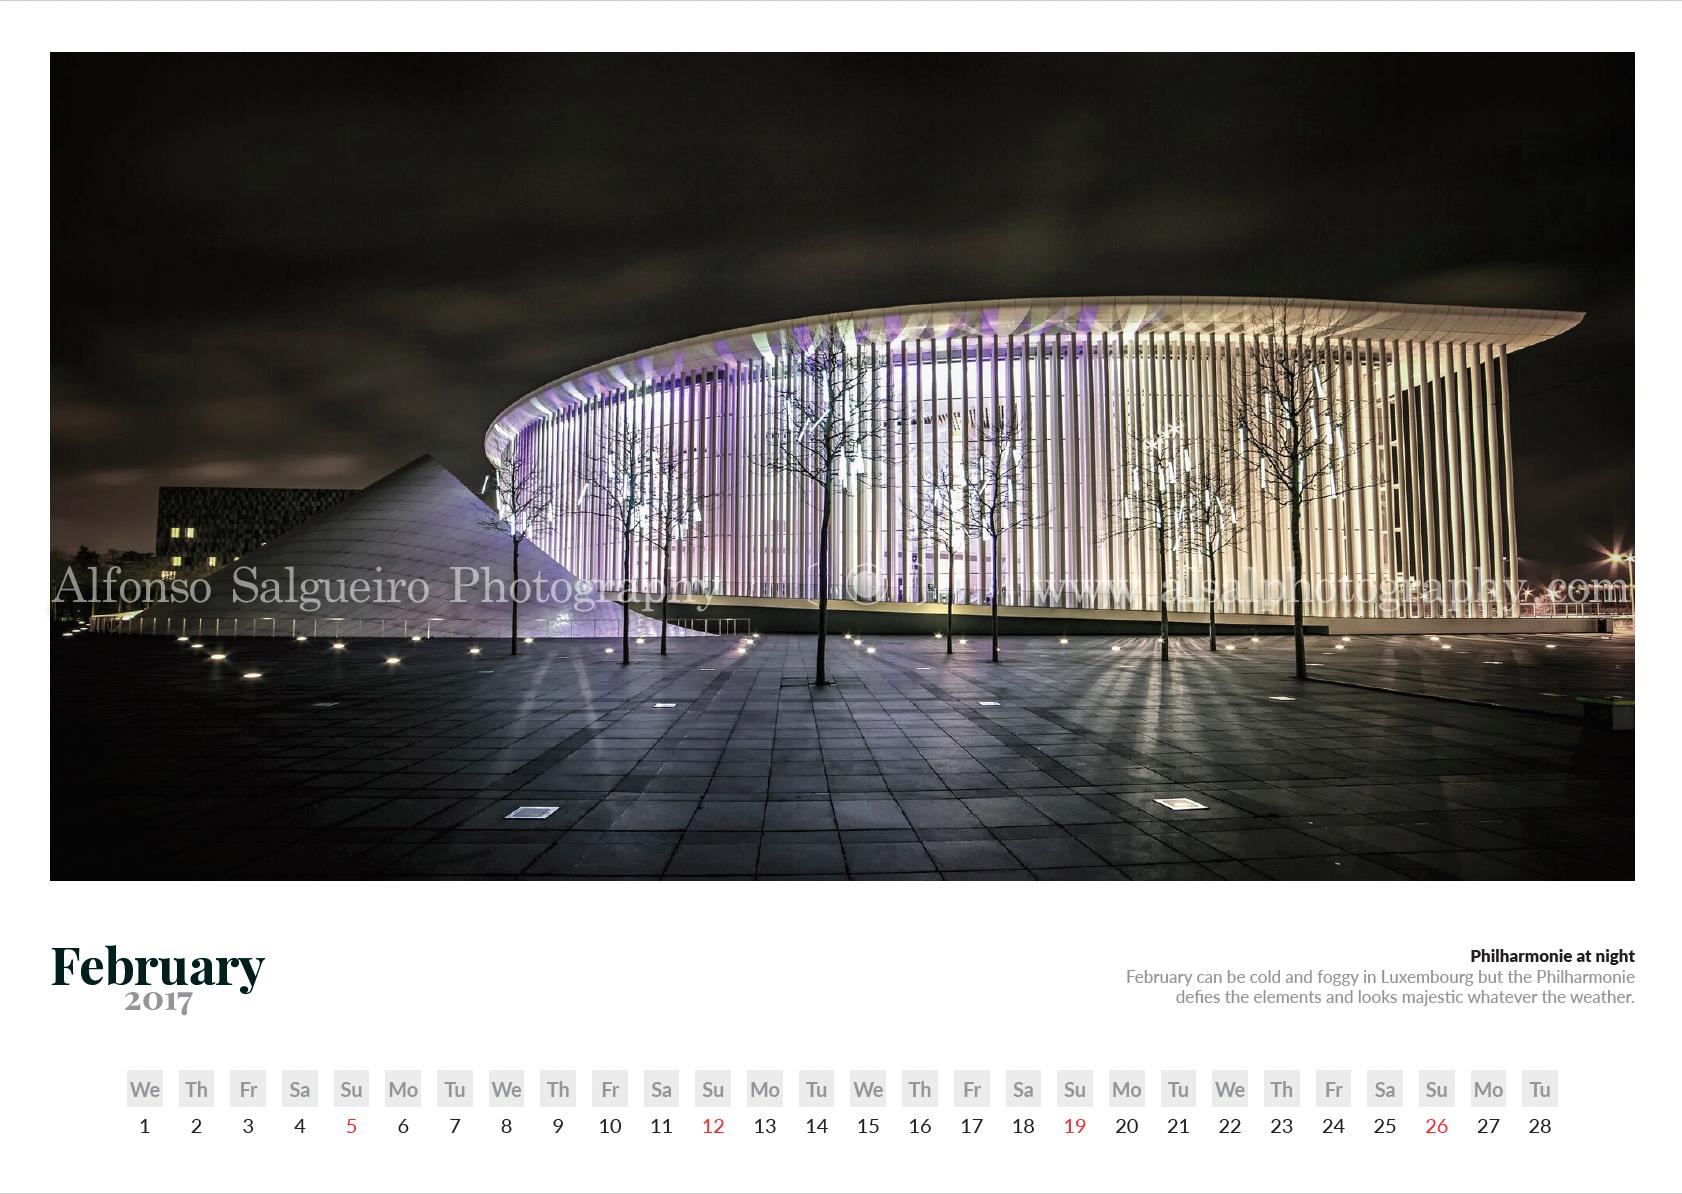 Luxembourg 2017 calendar-3.jpg